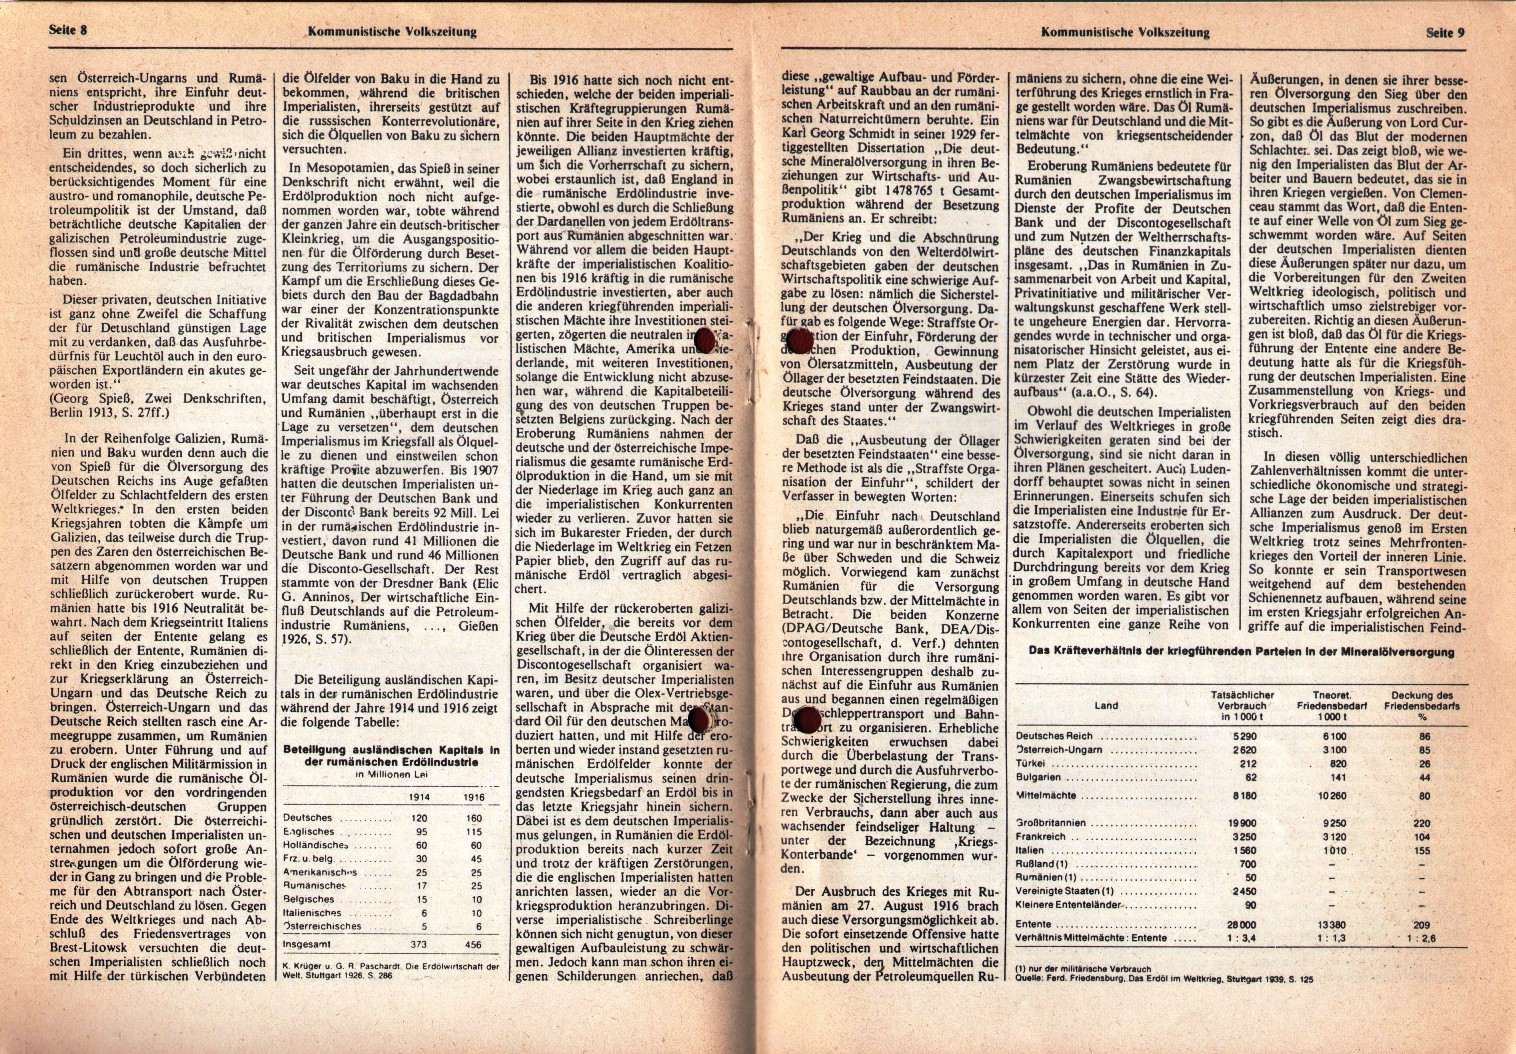 KBW_19791008_Energiepolitik005